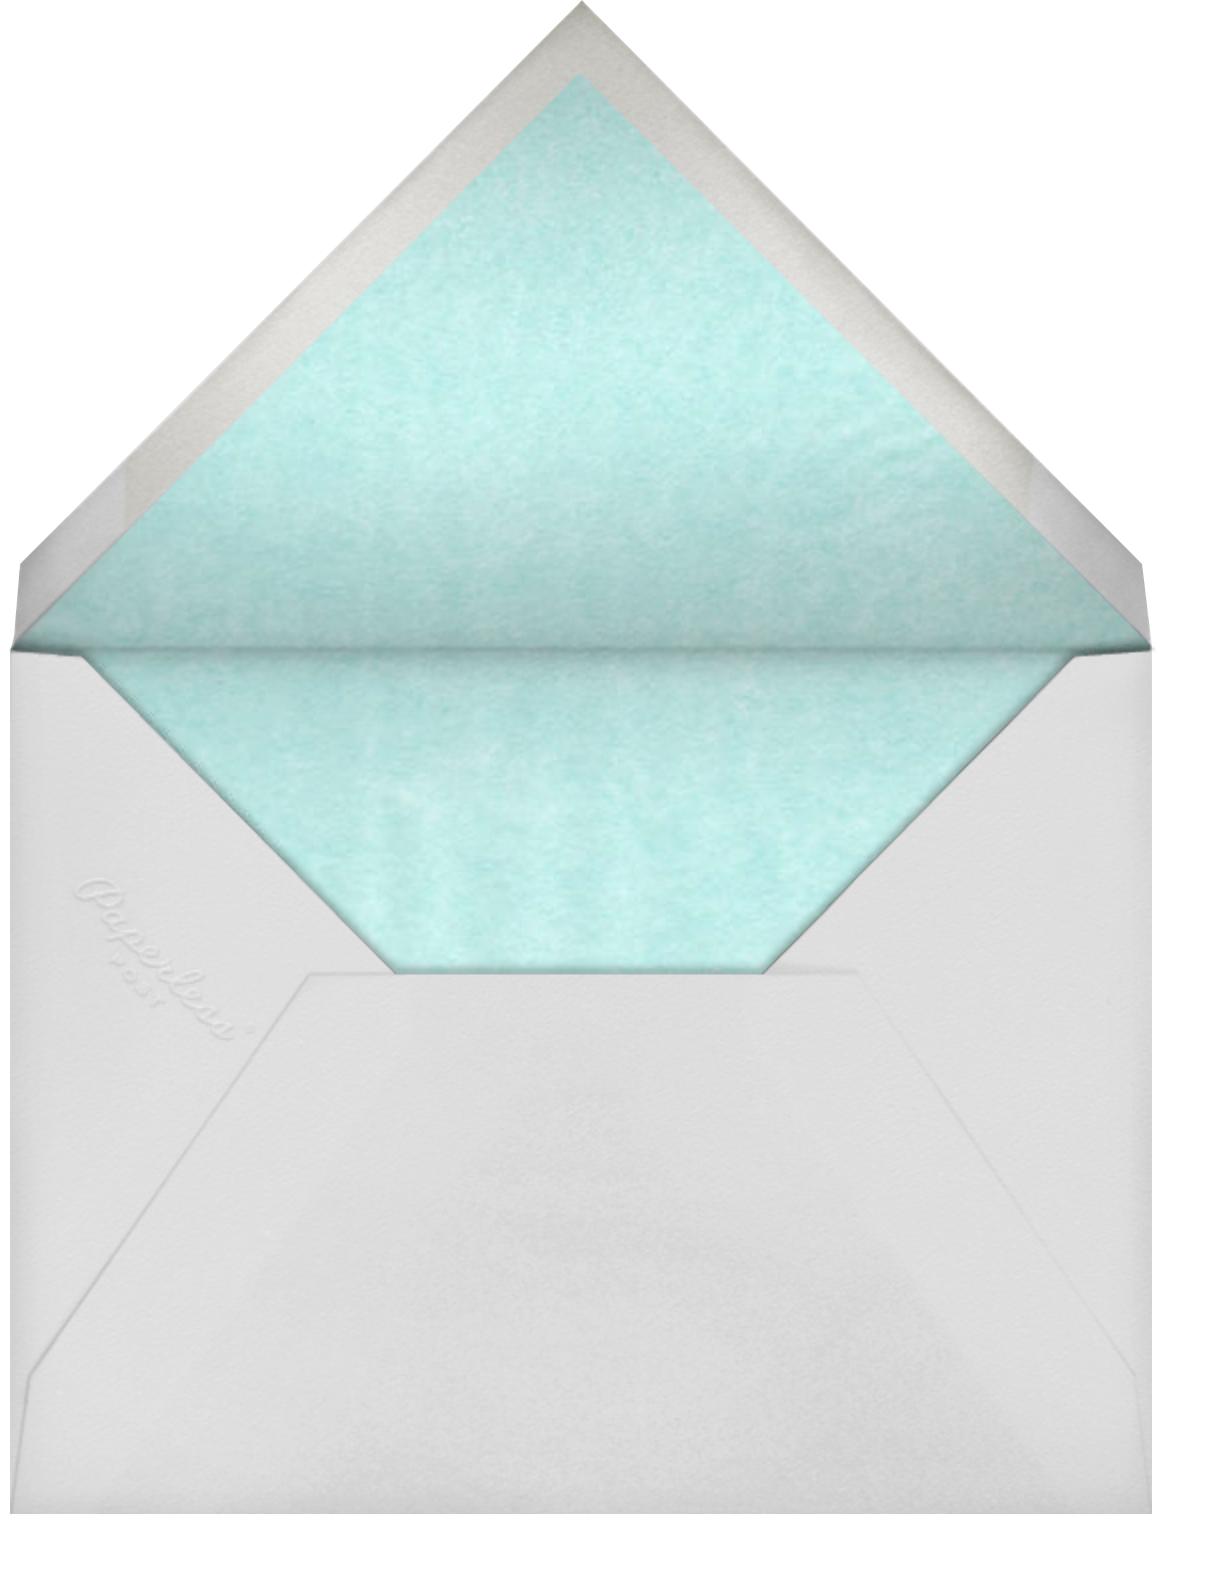 Morris Frame - Anthropologie - Mother's Day - envelope back